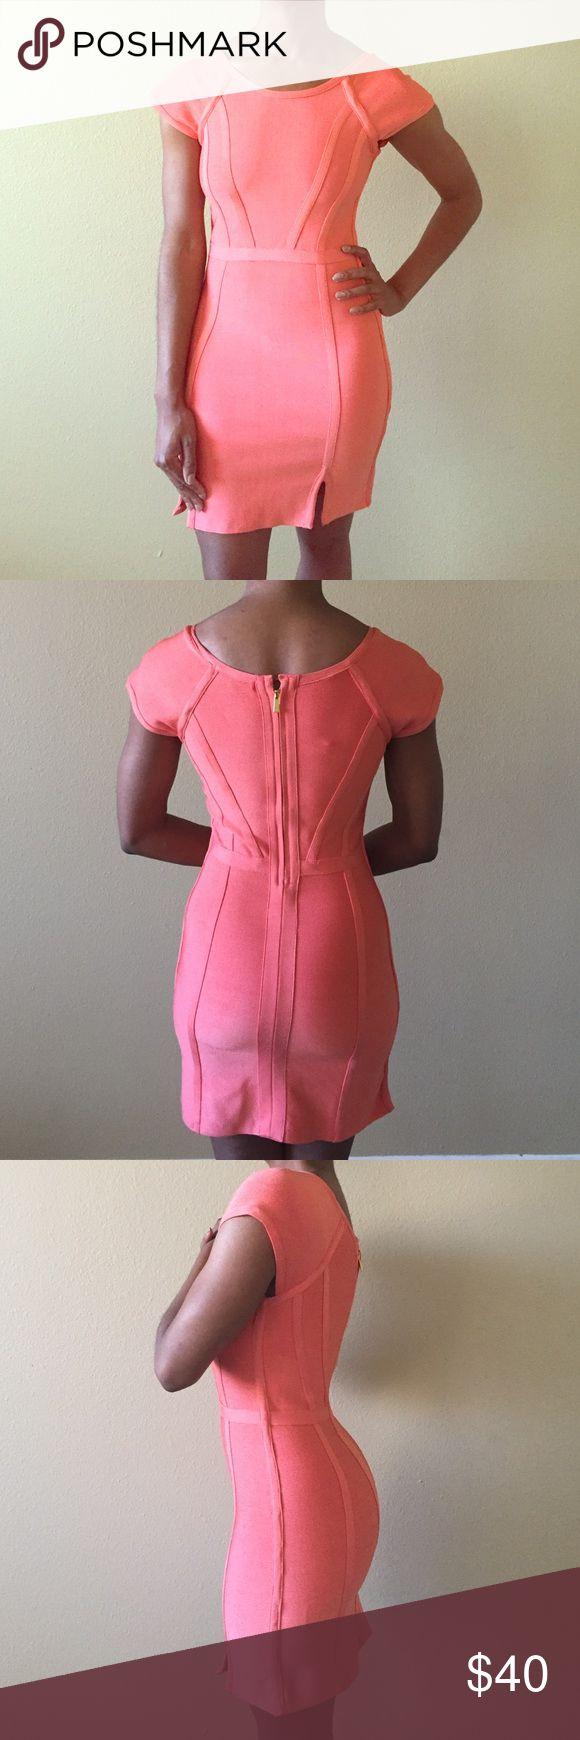 Stretta Bandage Bodycon Dress Beautiful  & Stretchy Dazzling Designer Dress. Stretta Dresses Mini